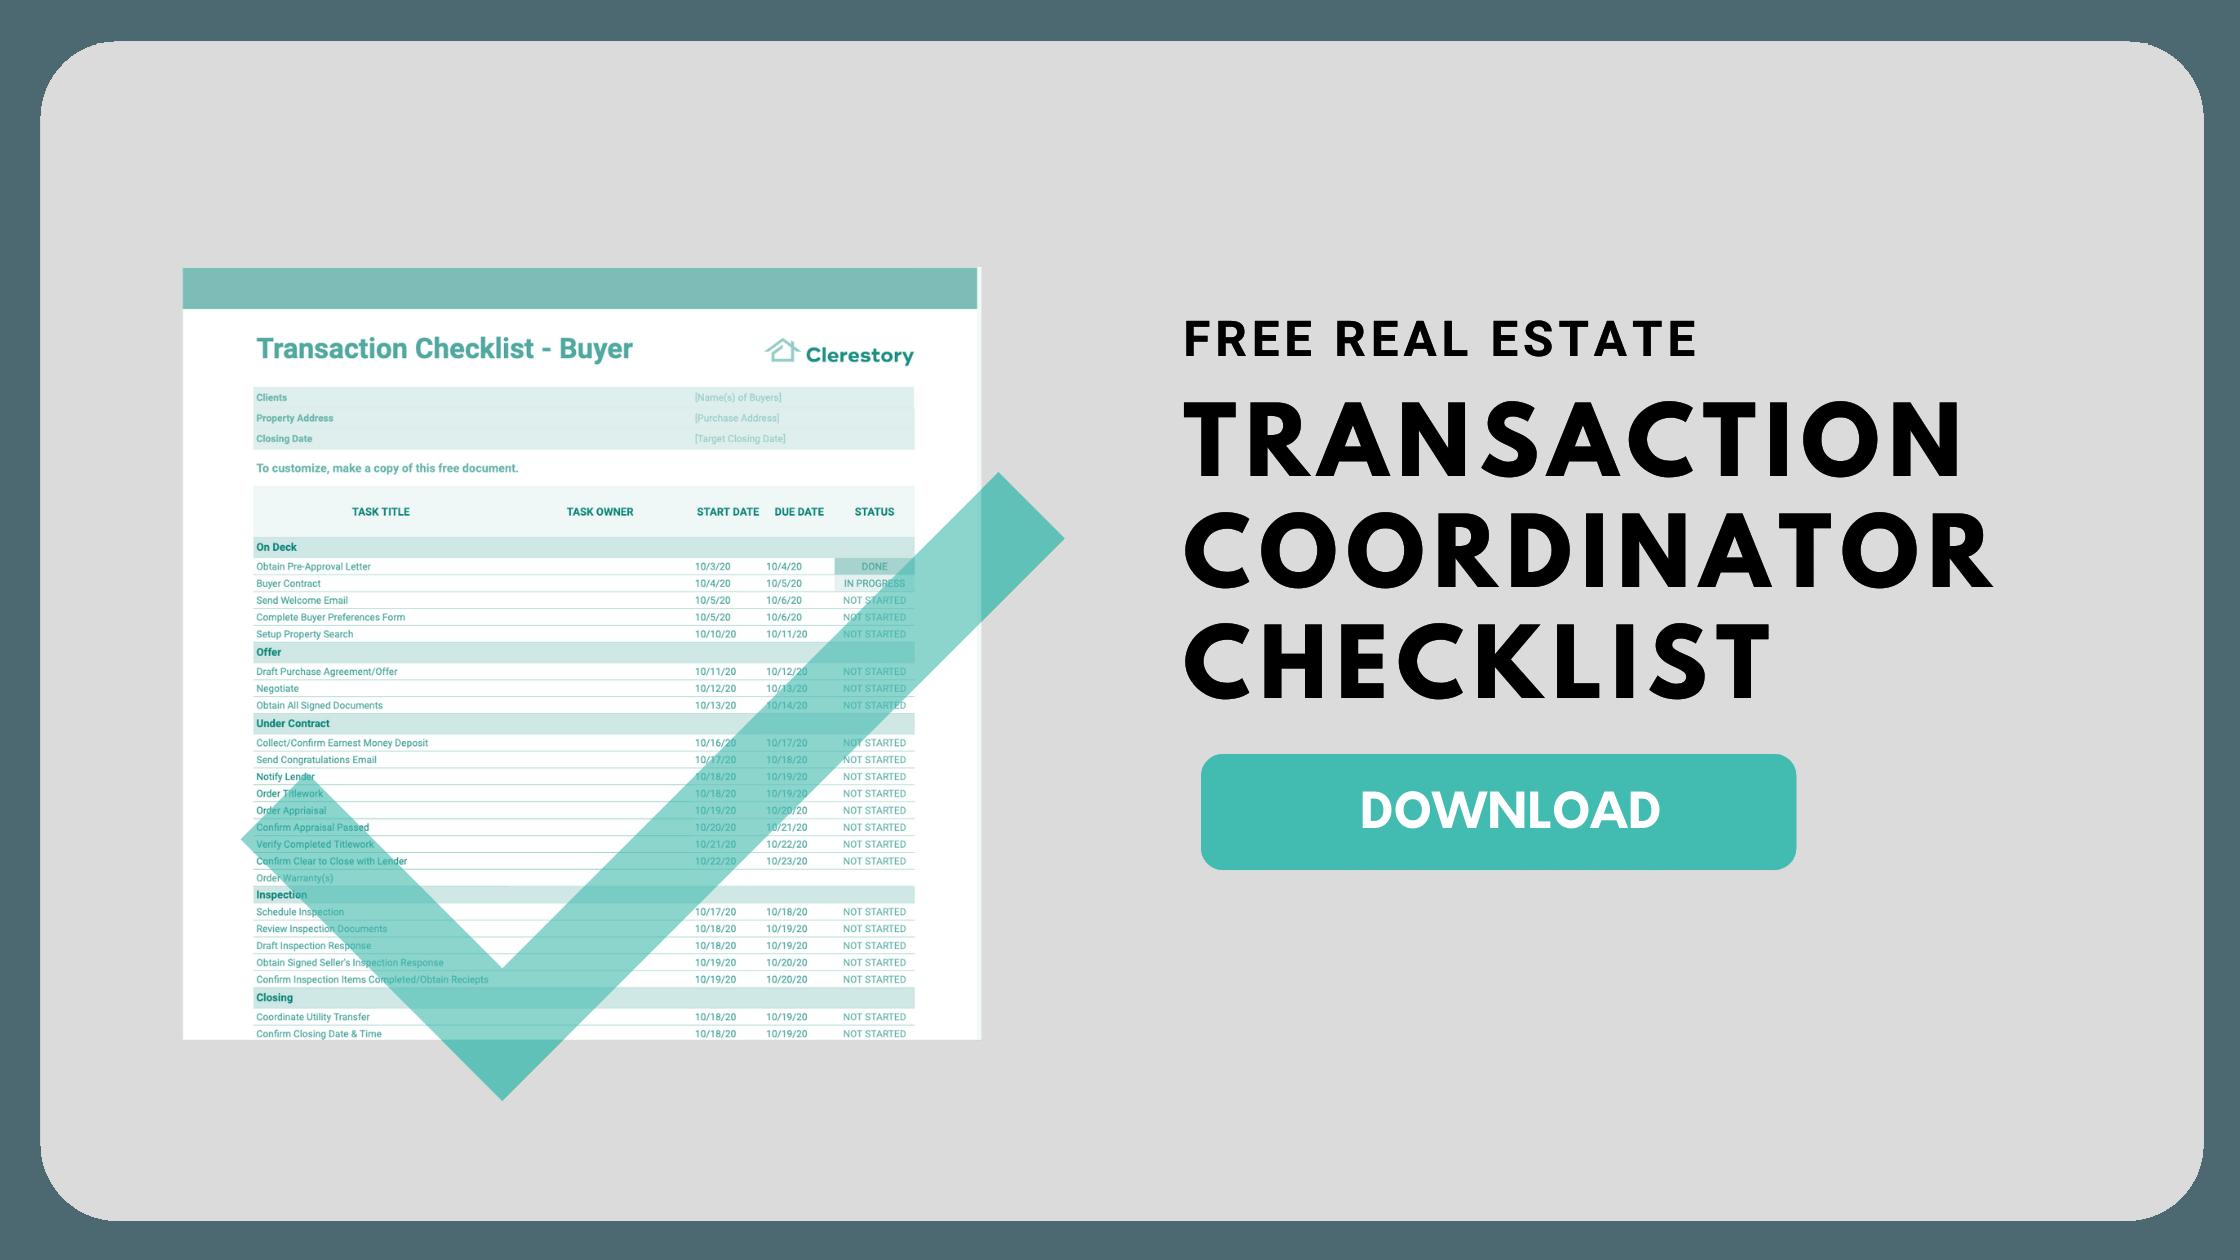 Free Real Estate Transaction Coordinator Checklist Template